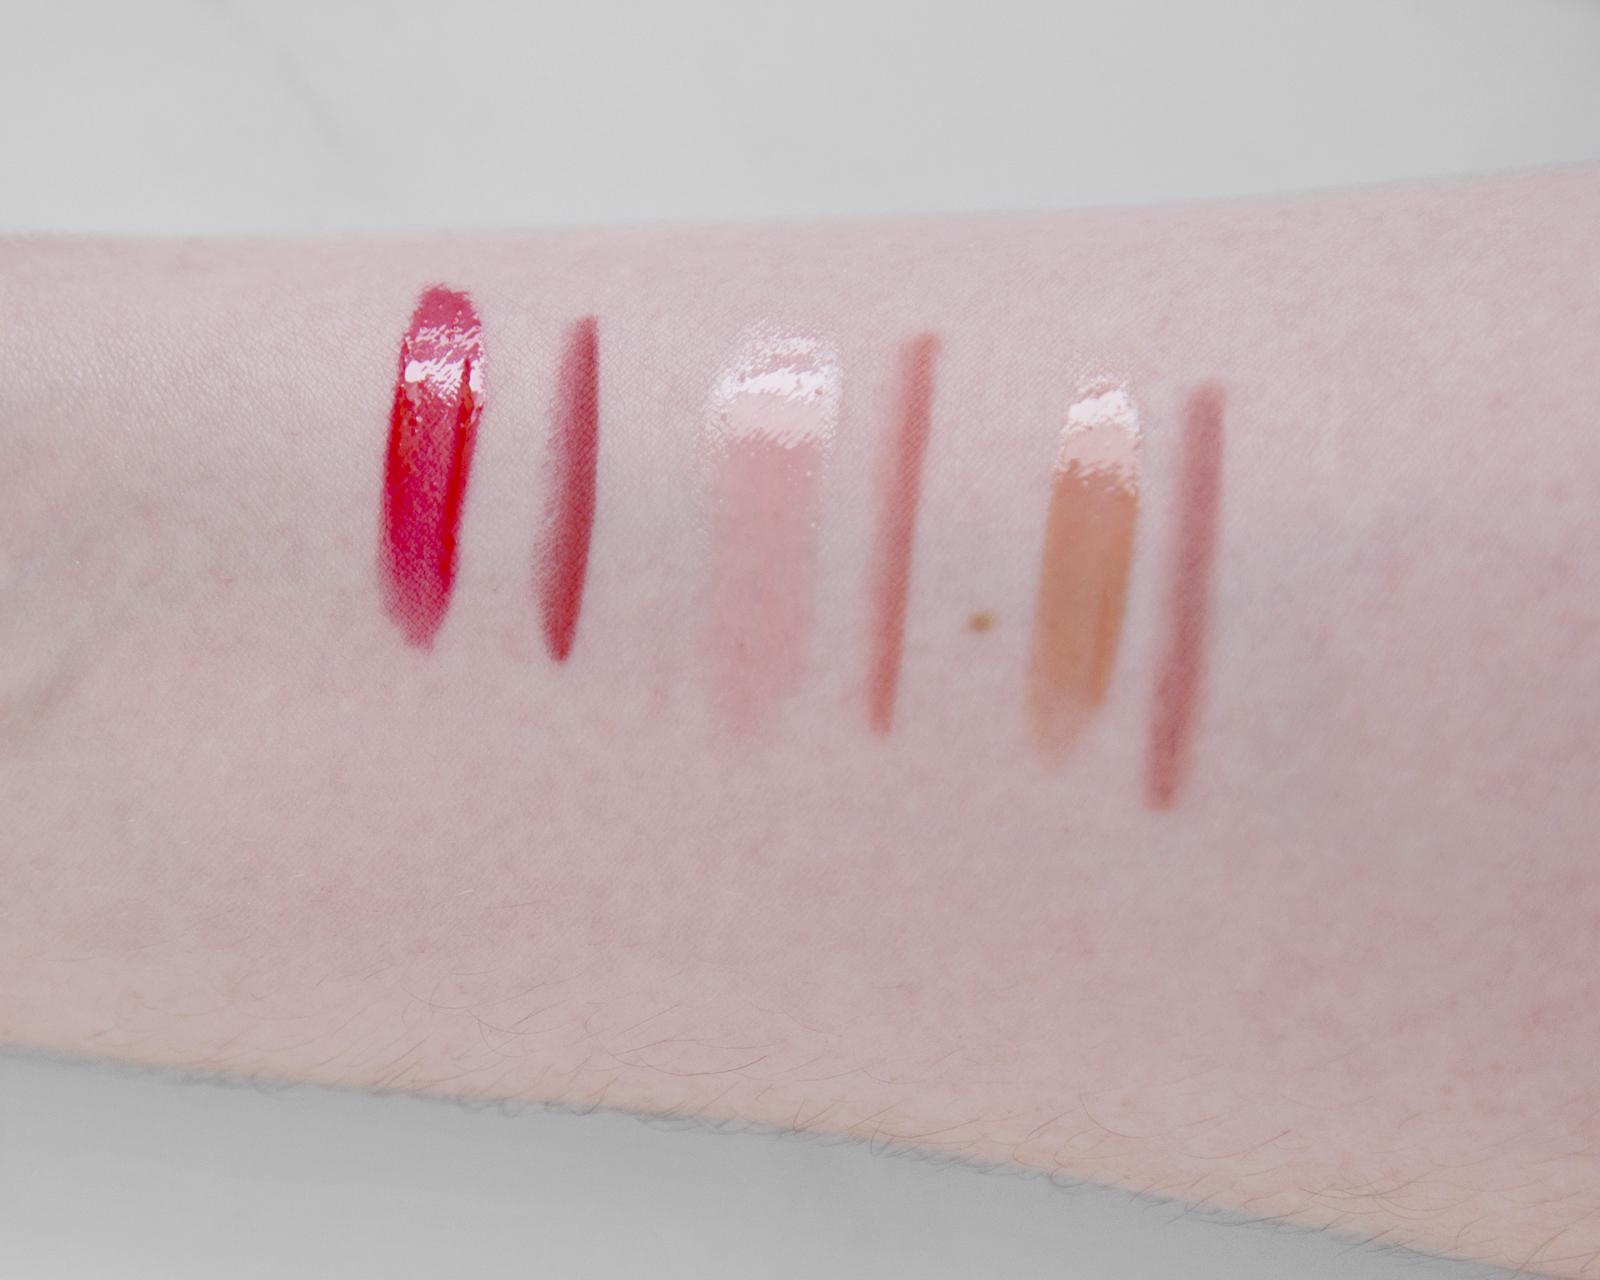 L-R: Red Vixen Lip Lustre, Savage Rose Lip Cheat, Potobello Girl Lip Lustre, Pink Venus Lip Cheat, Seduction Lip Lustre and Pillow Talk Lip Cheat